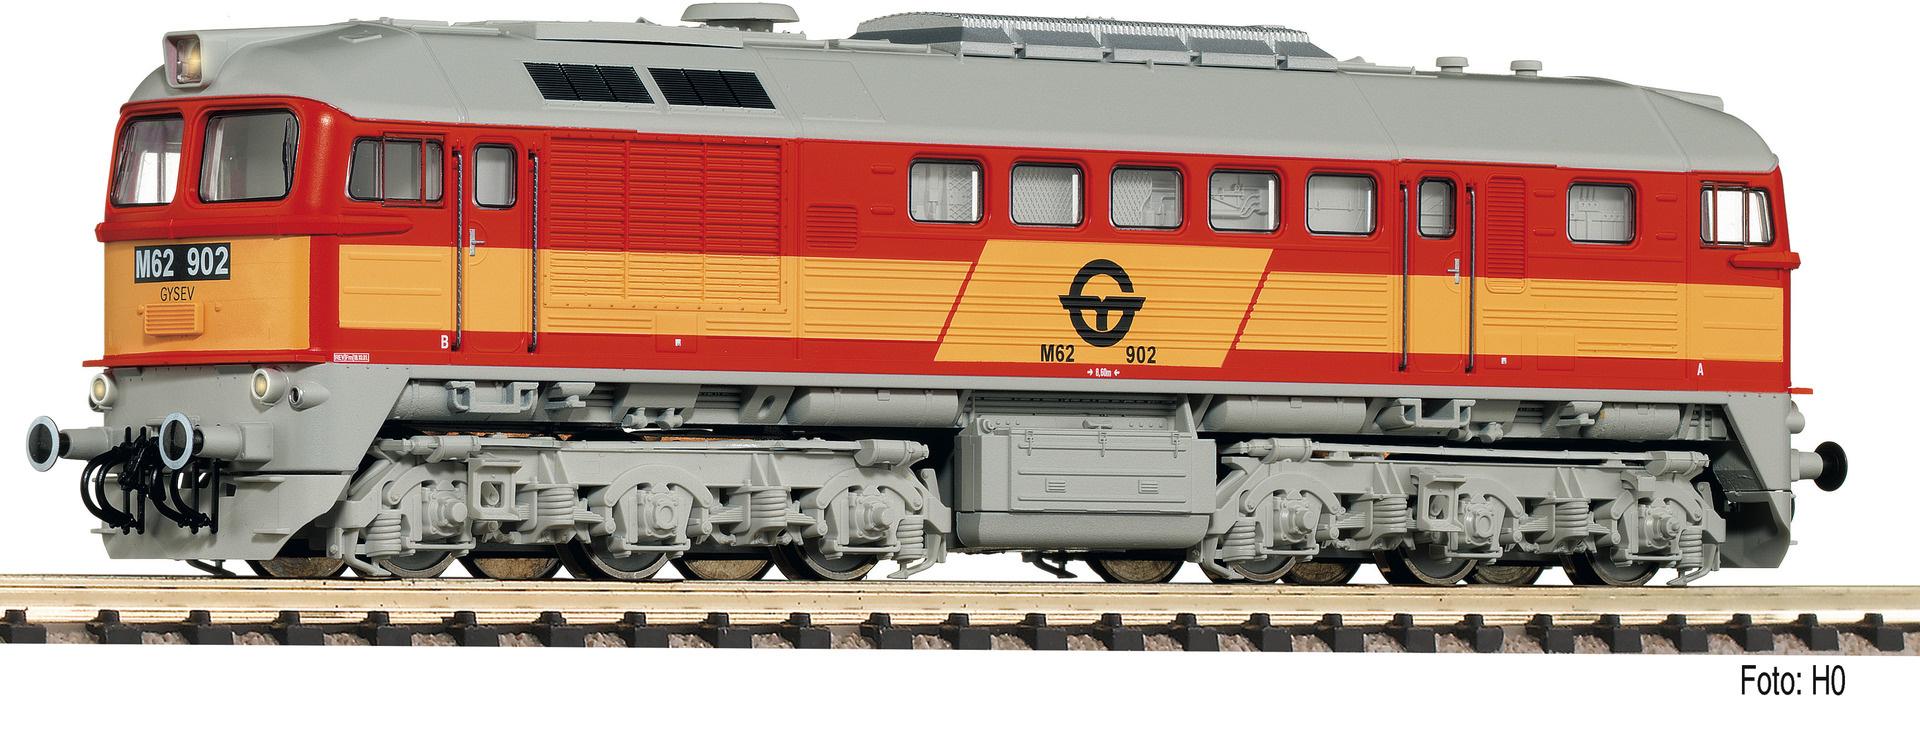 725211 Diesellok M62, orange, gelb-1